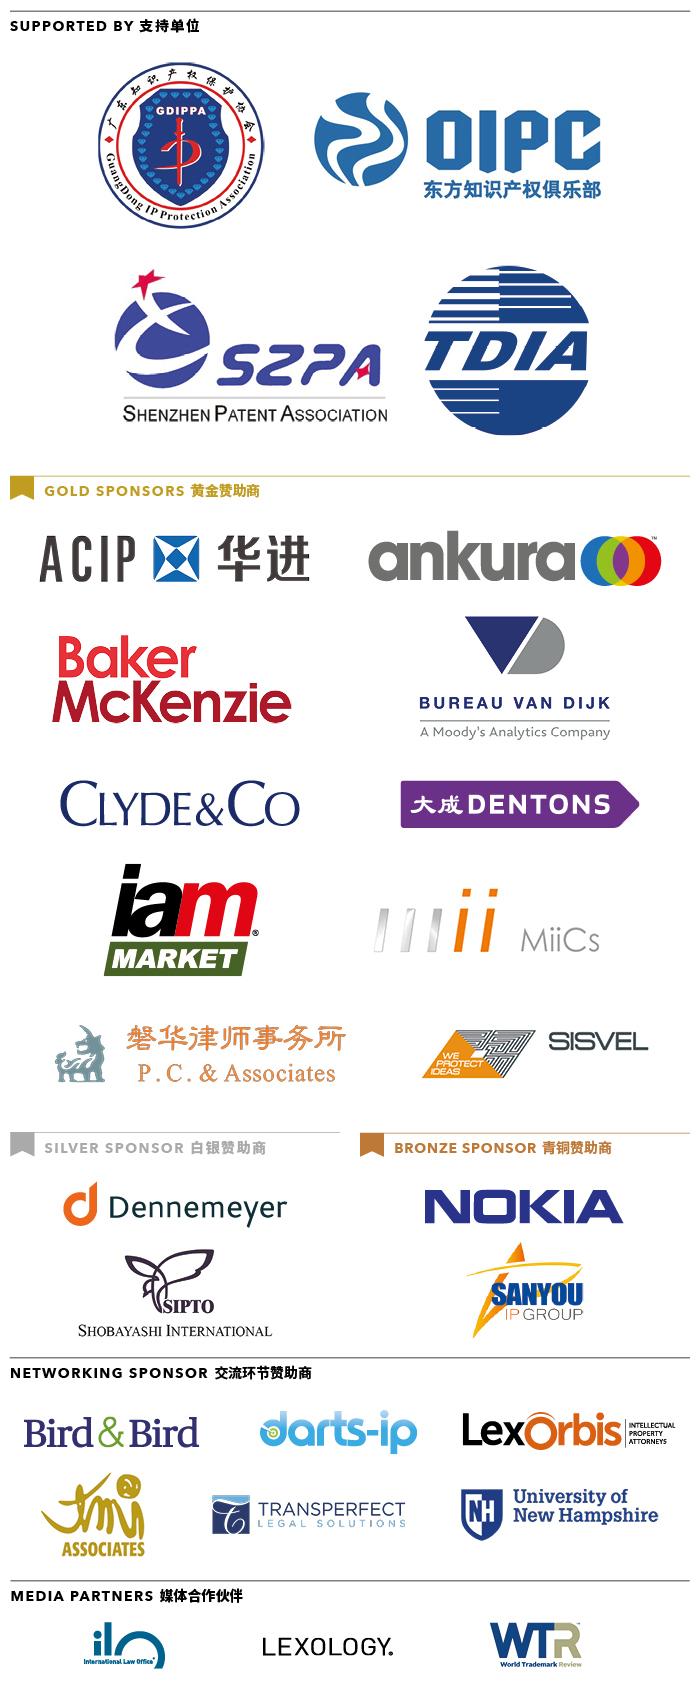 DD-IPD-509-Shenzen-2019-sponsor-image-v12